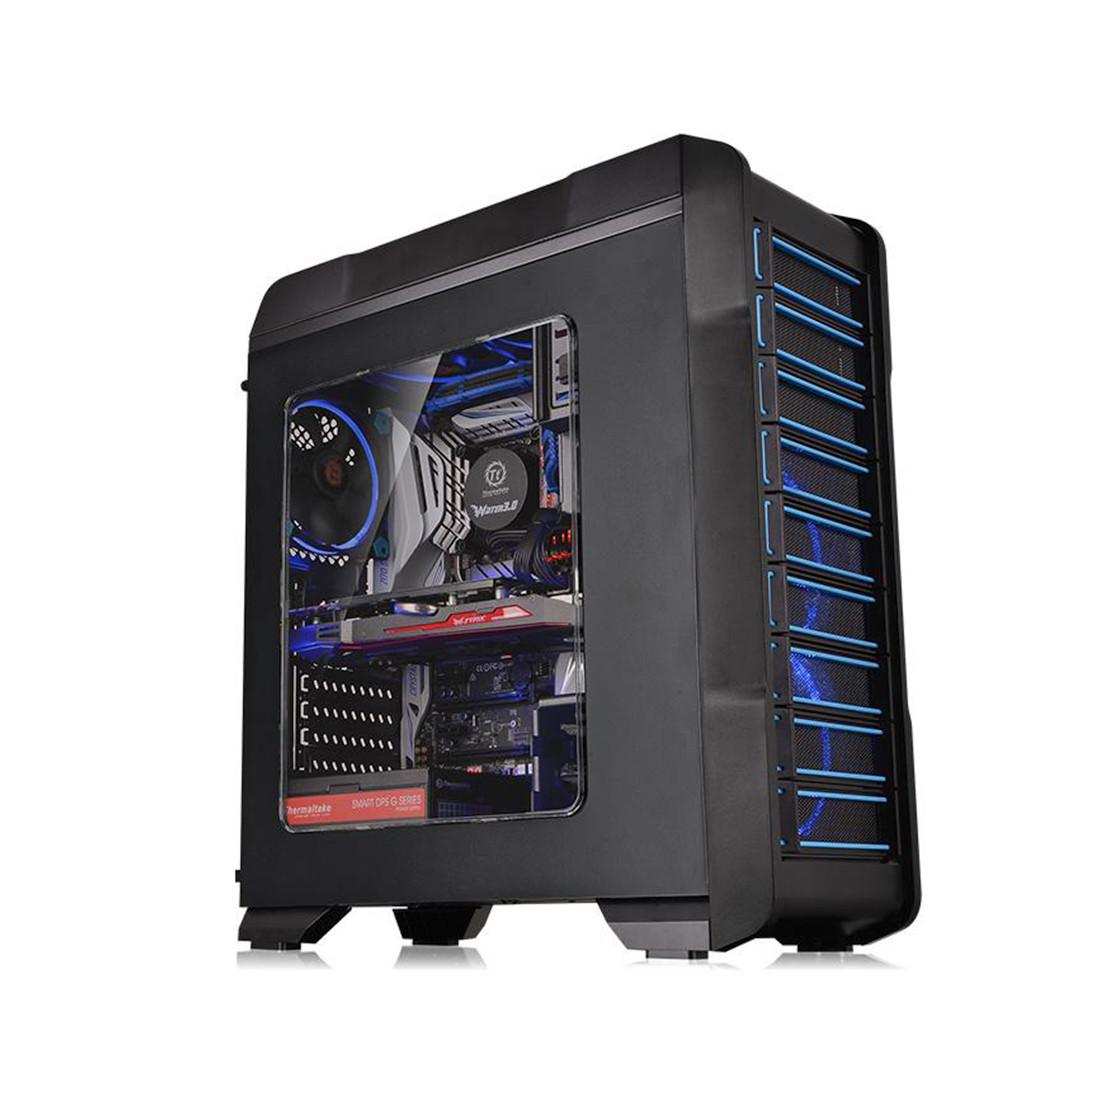 Кейс, Thermaltake, Versa N23 (CA-1E2-00M1WN-00), ATX/Micro ATX, USB1*3.0, USB2*2.0, HD-Audio, Кулер 12см, Без Б/П, Чёрный